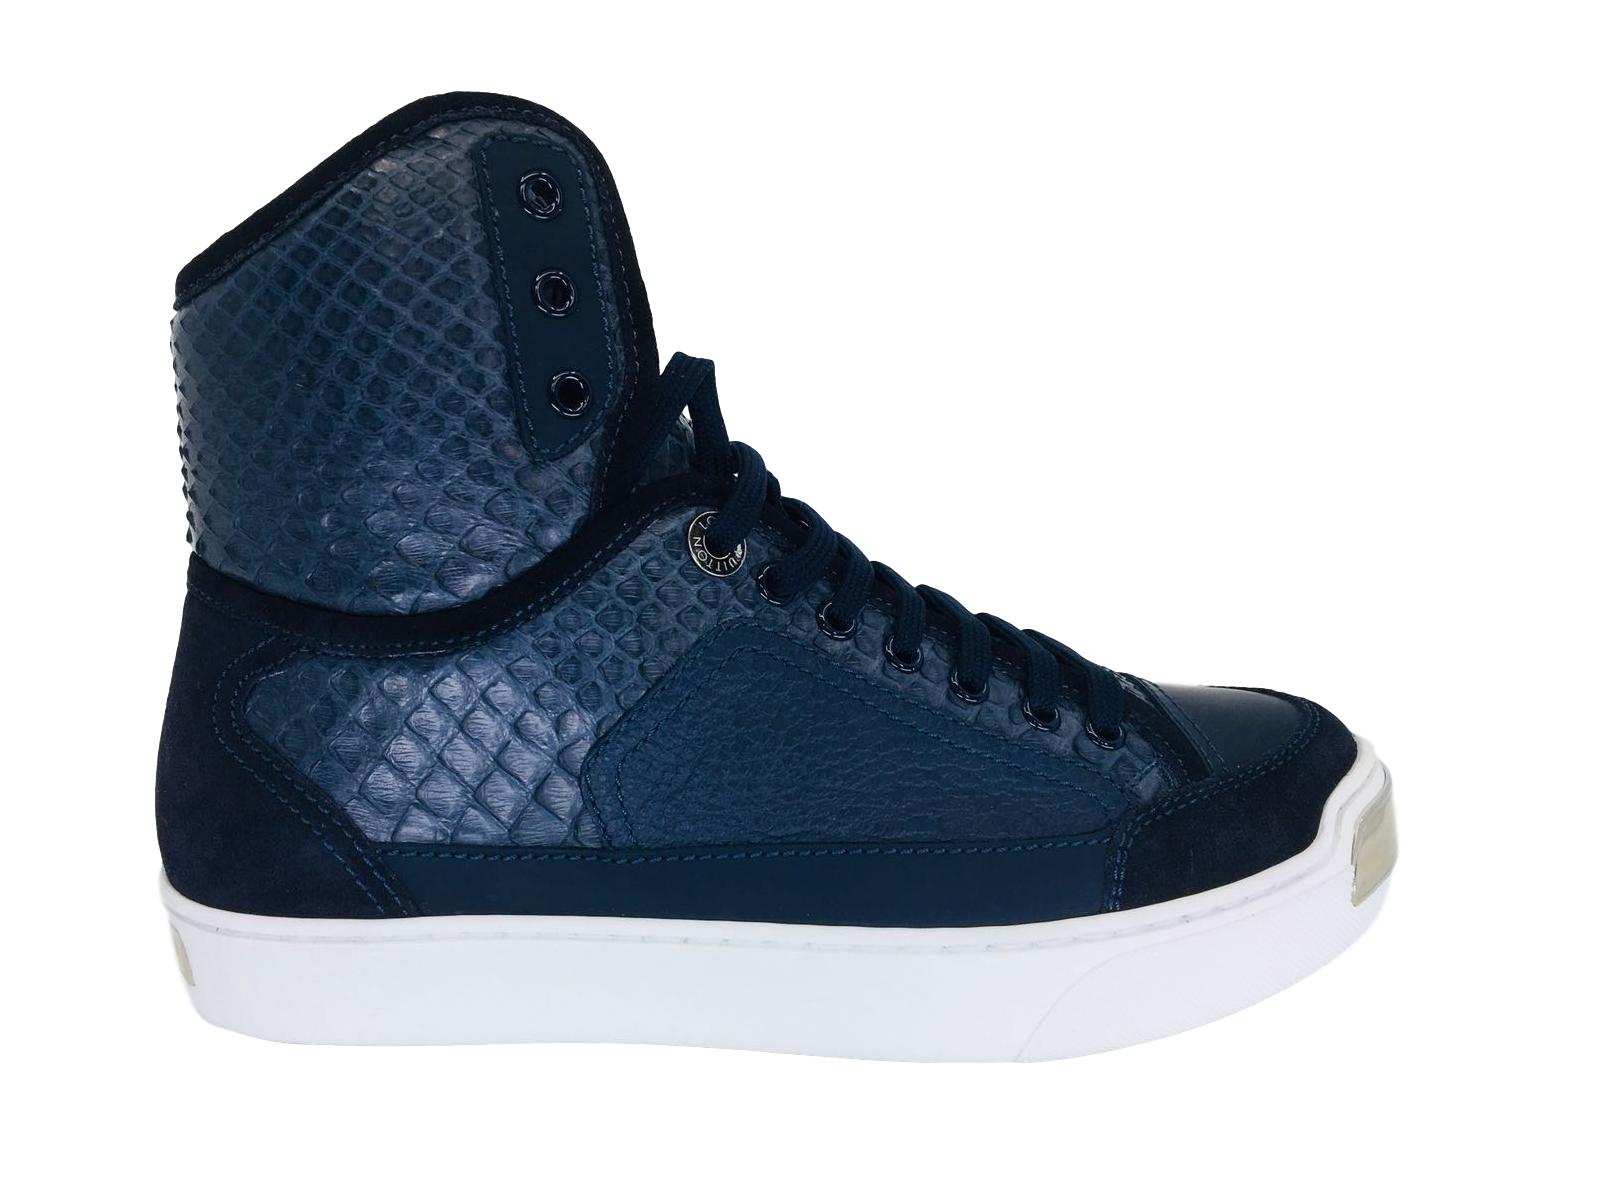 bafeaec37c9 On The Road Sneaker Boot Python Skin | Louis Vuitton Sneakers & Slip ...